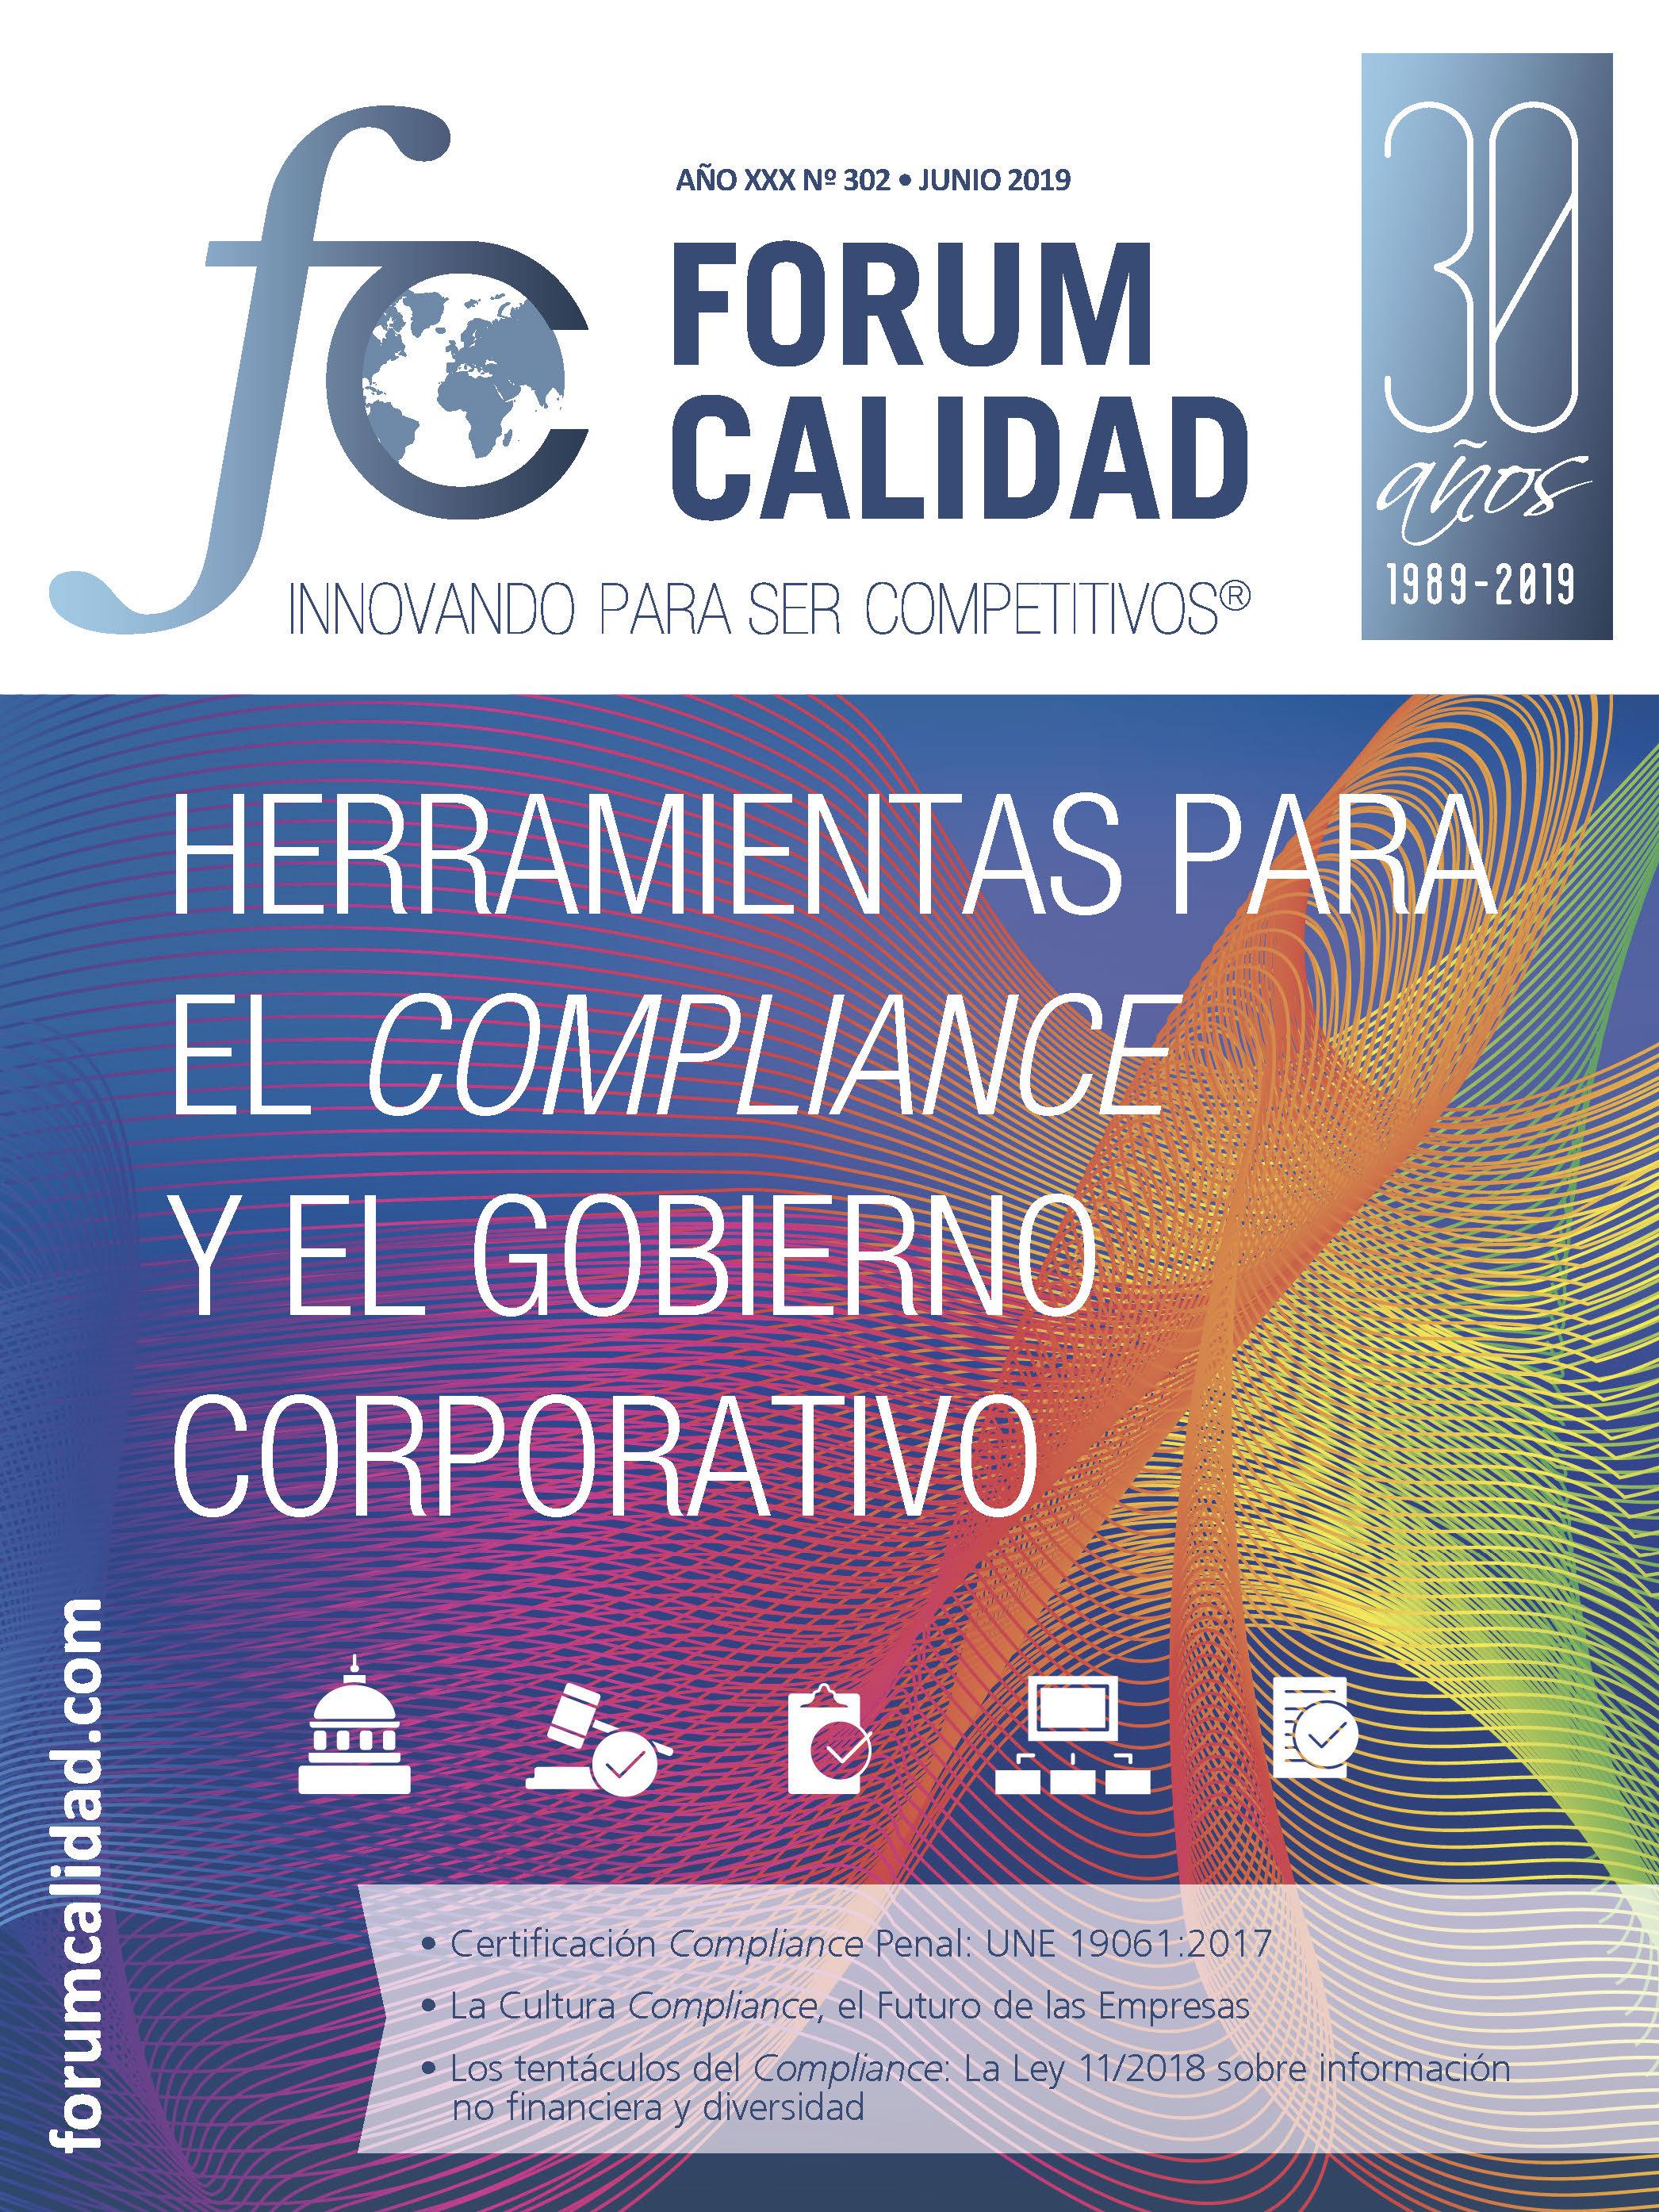 Forum Calidad nº 302 Junio 2019